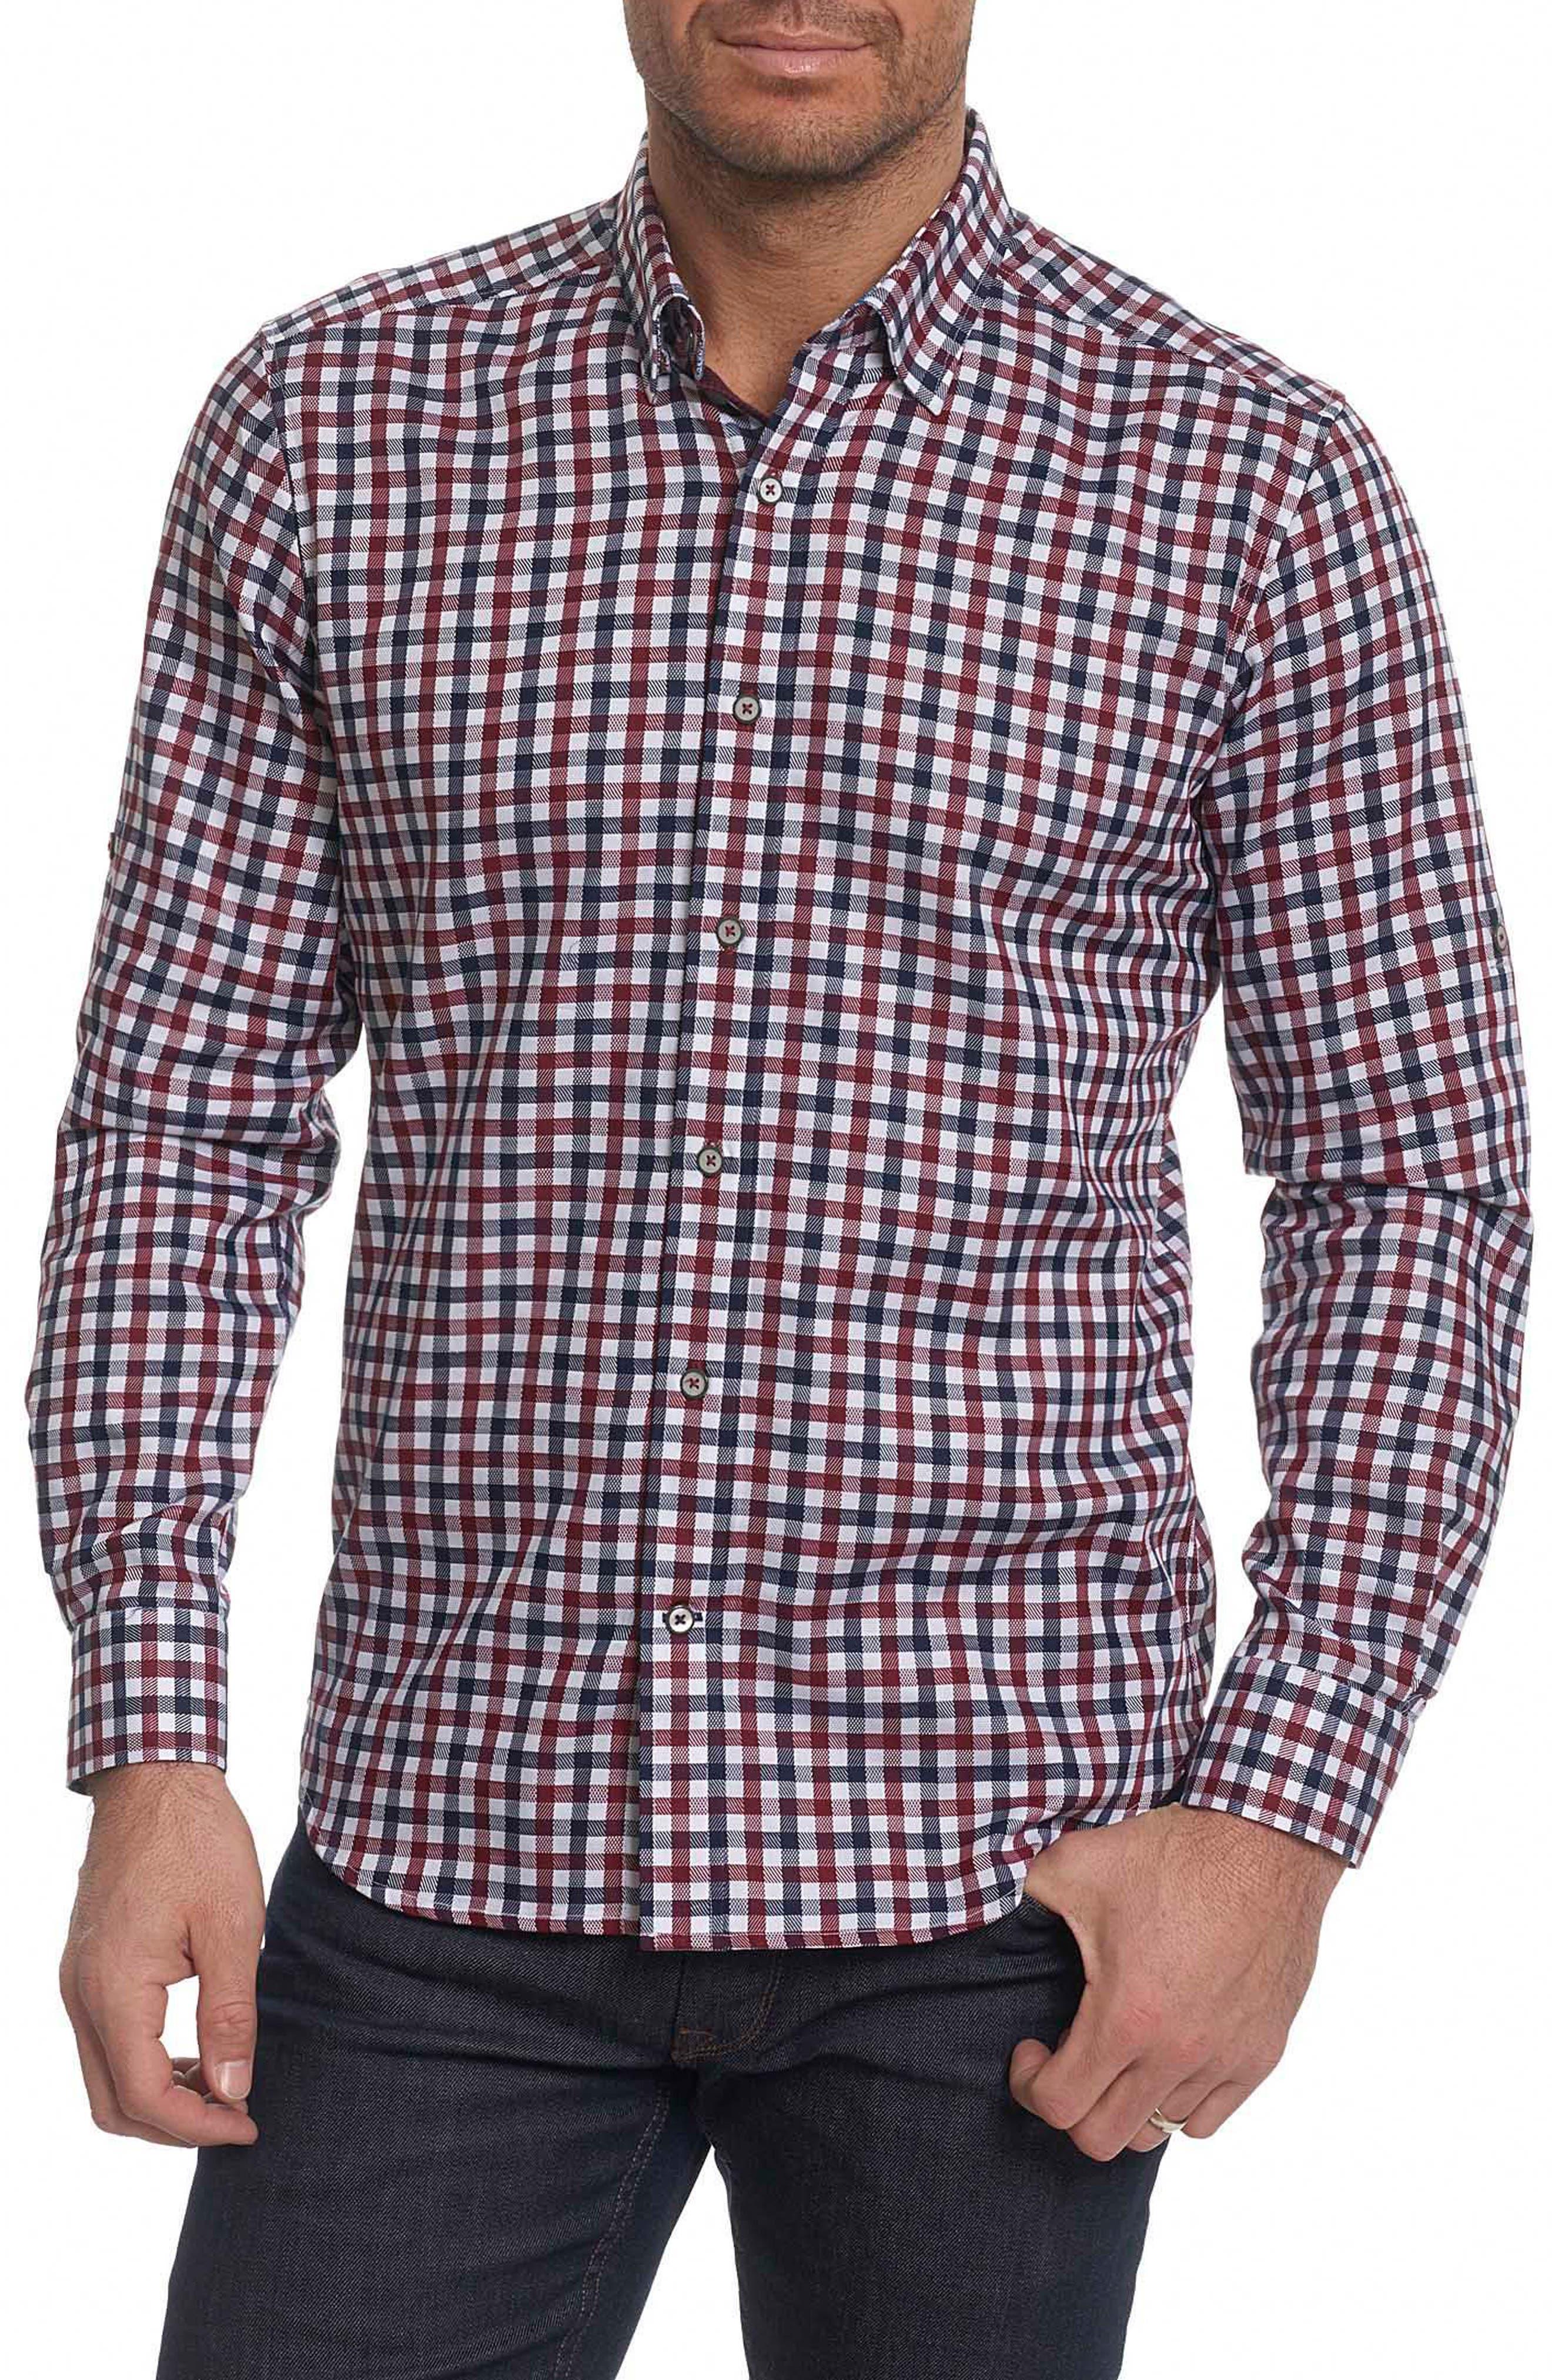 Main Image - Robert Graham Travis Tailored Fit Check Sport Shirt